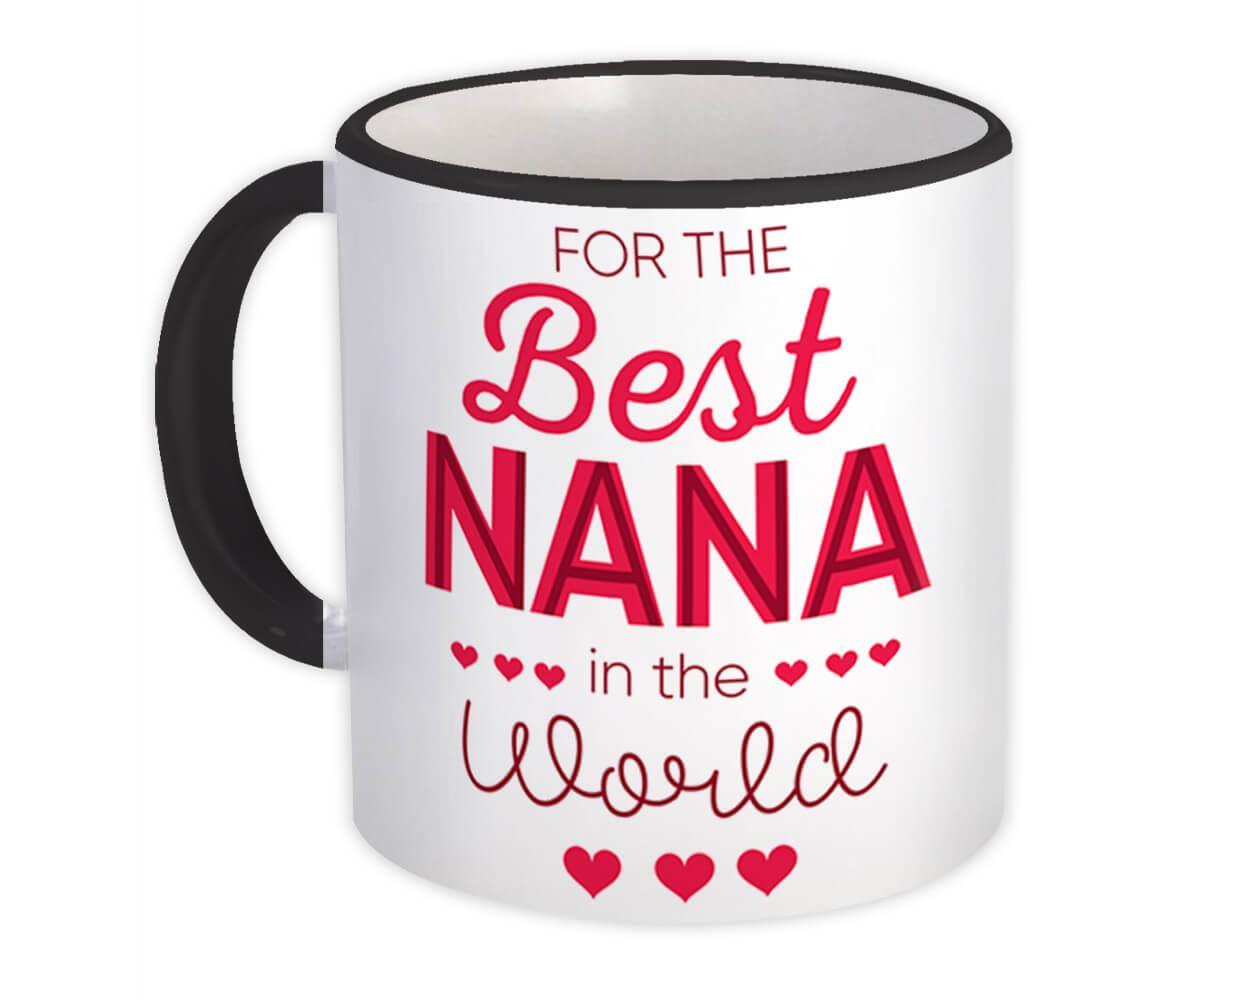 For the Best Nana in the World : Gift Mug Grandma Gigi Mimi Family Love